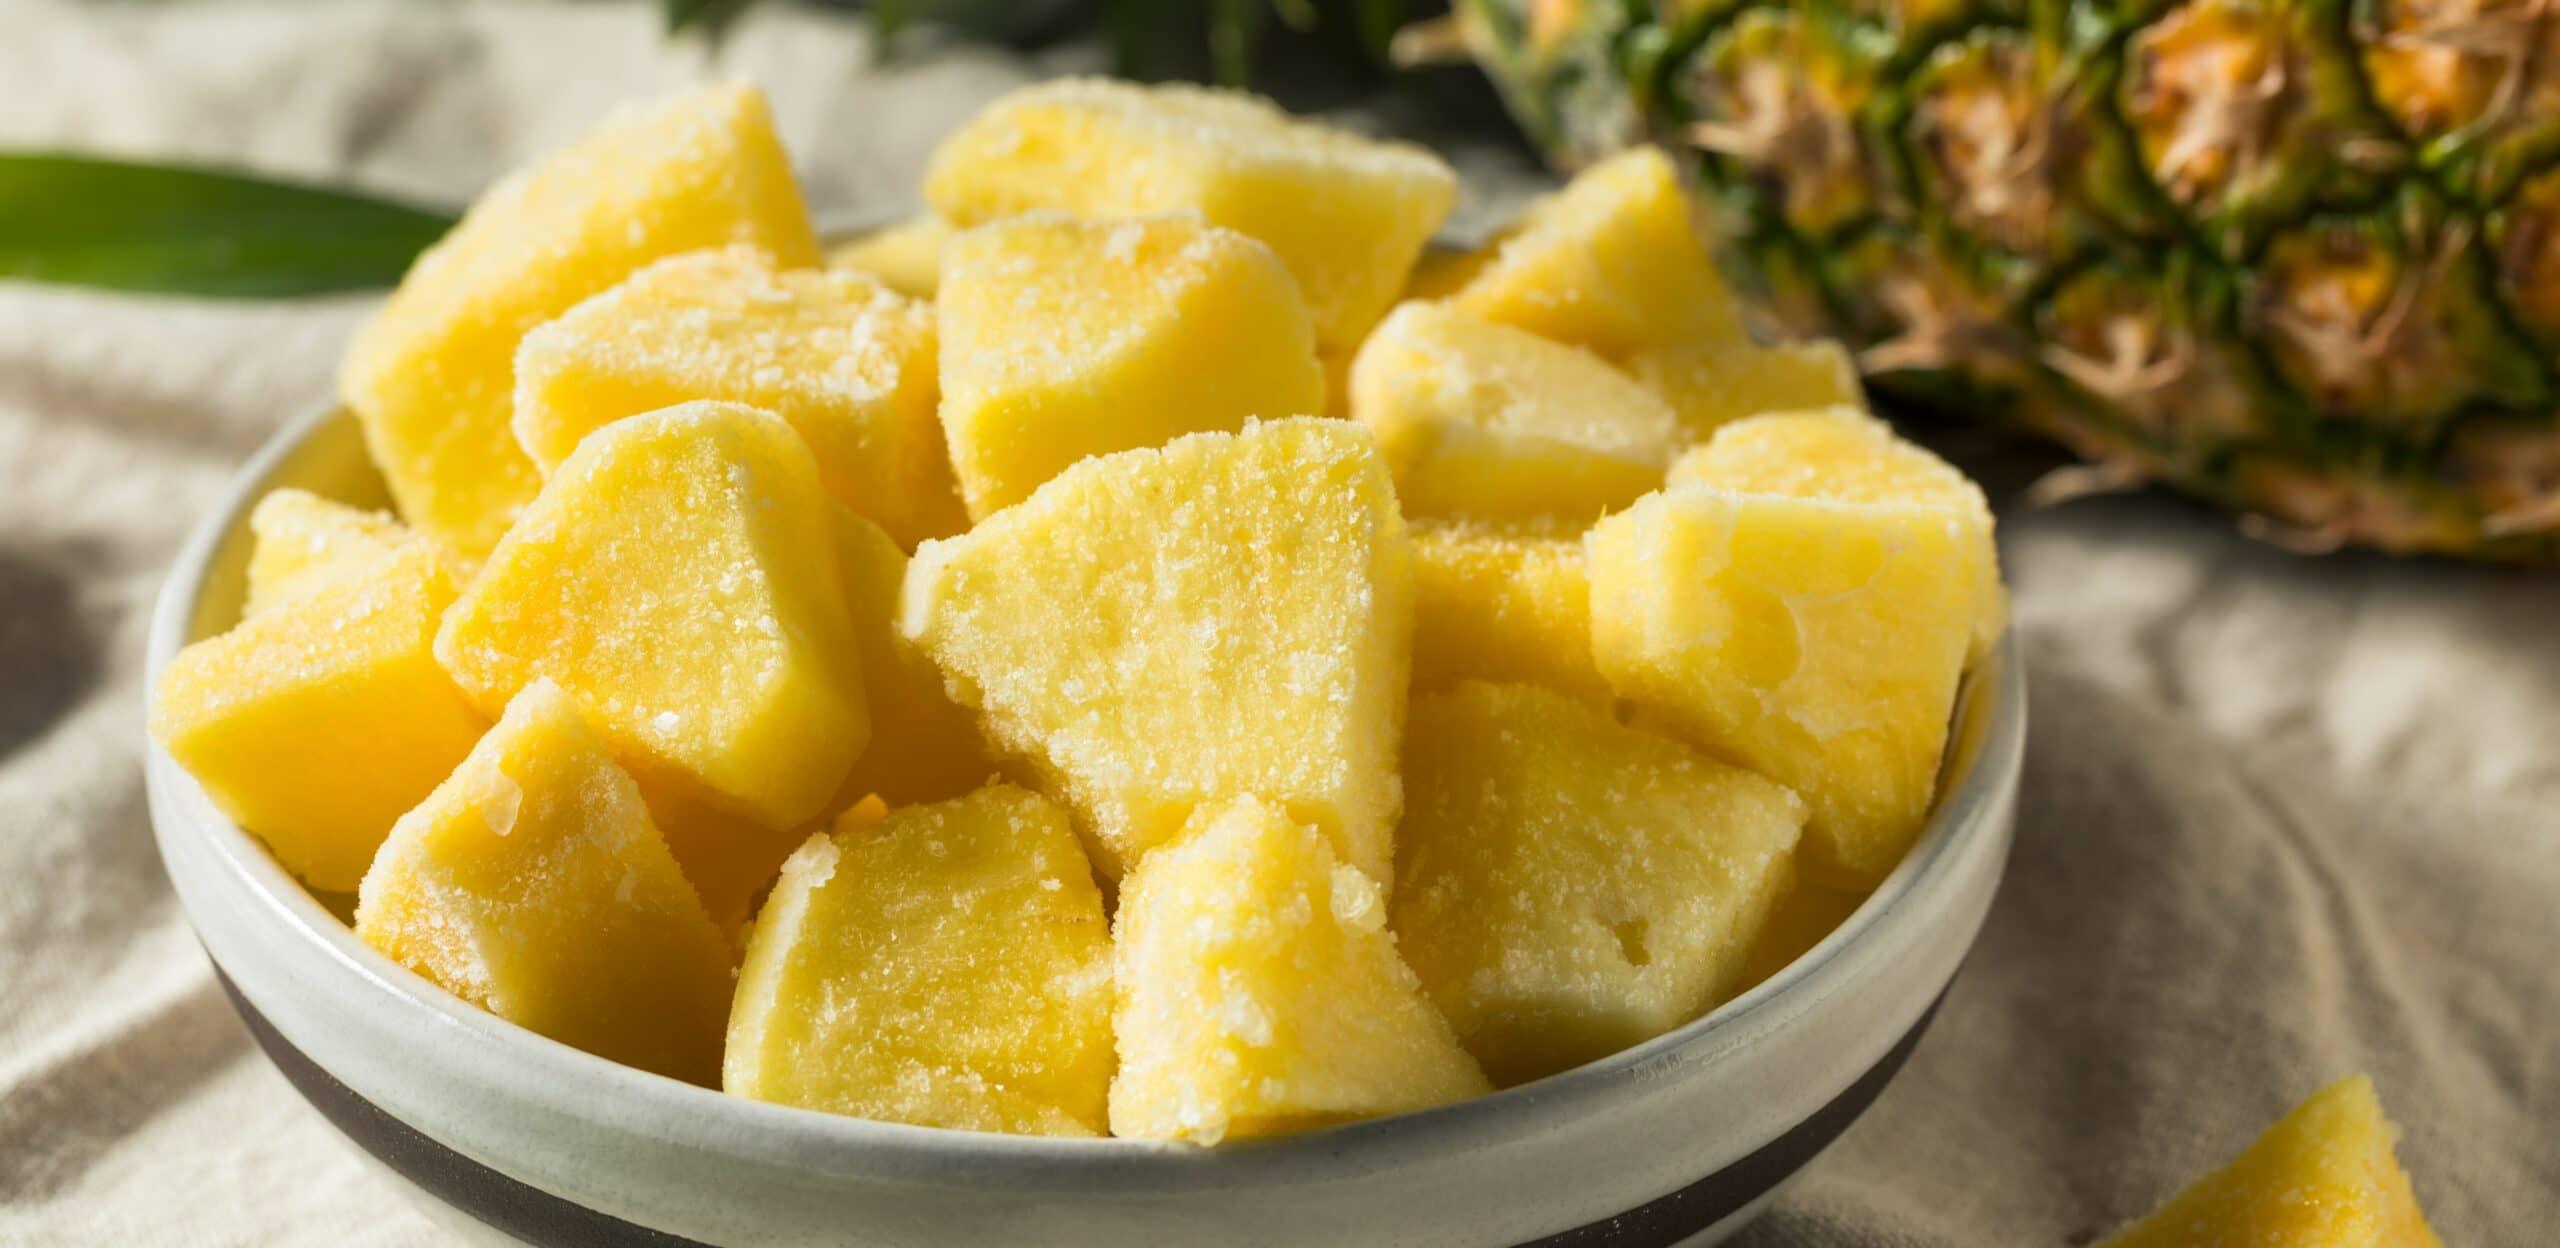 bromelina e ananas benefici